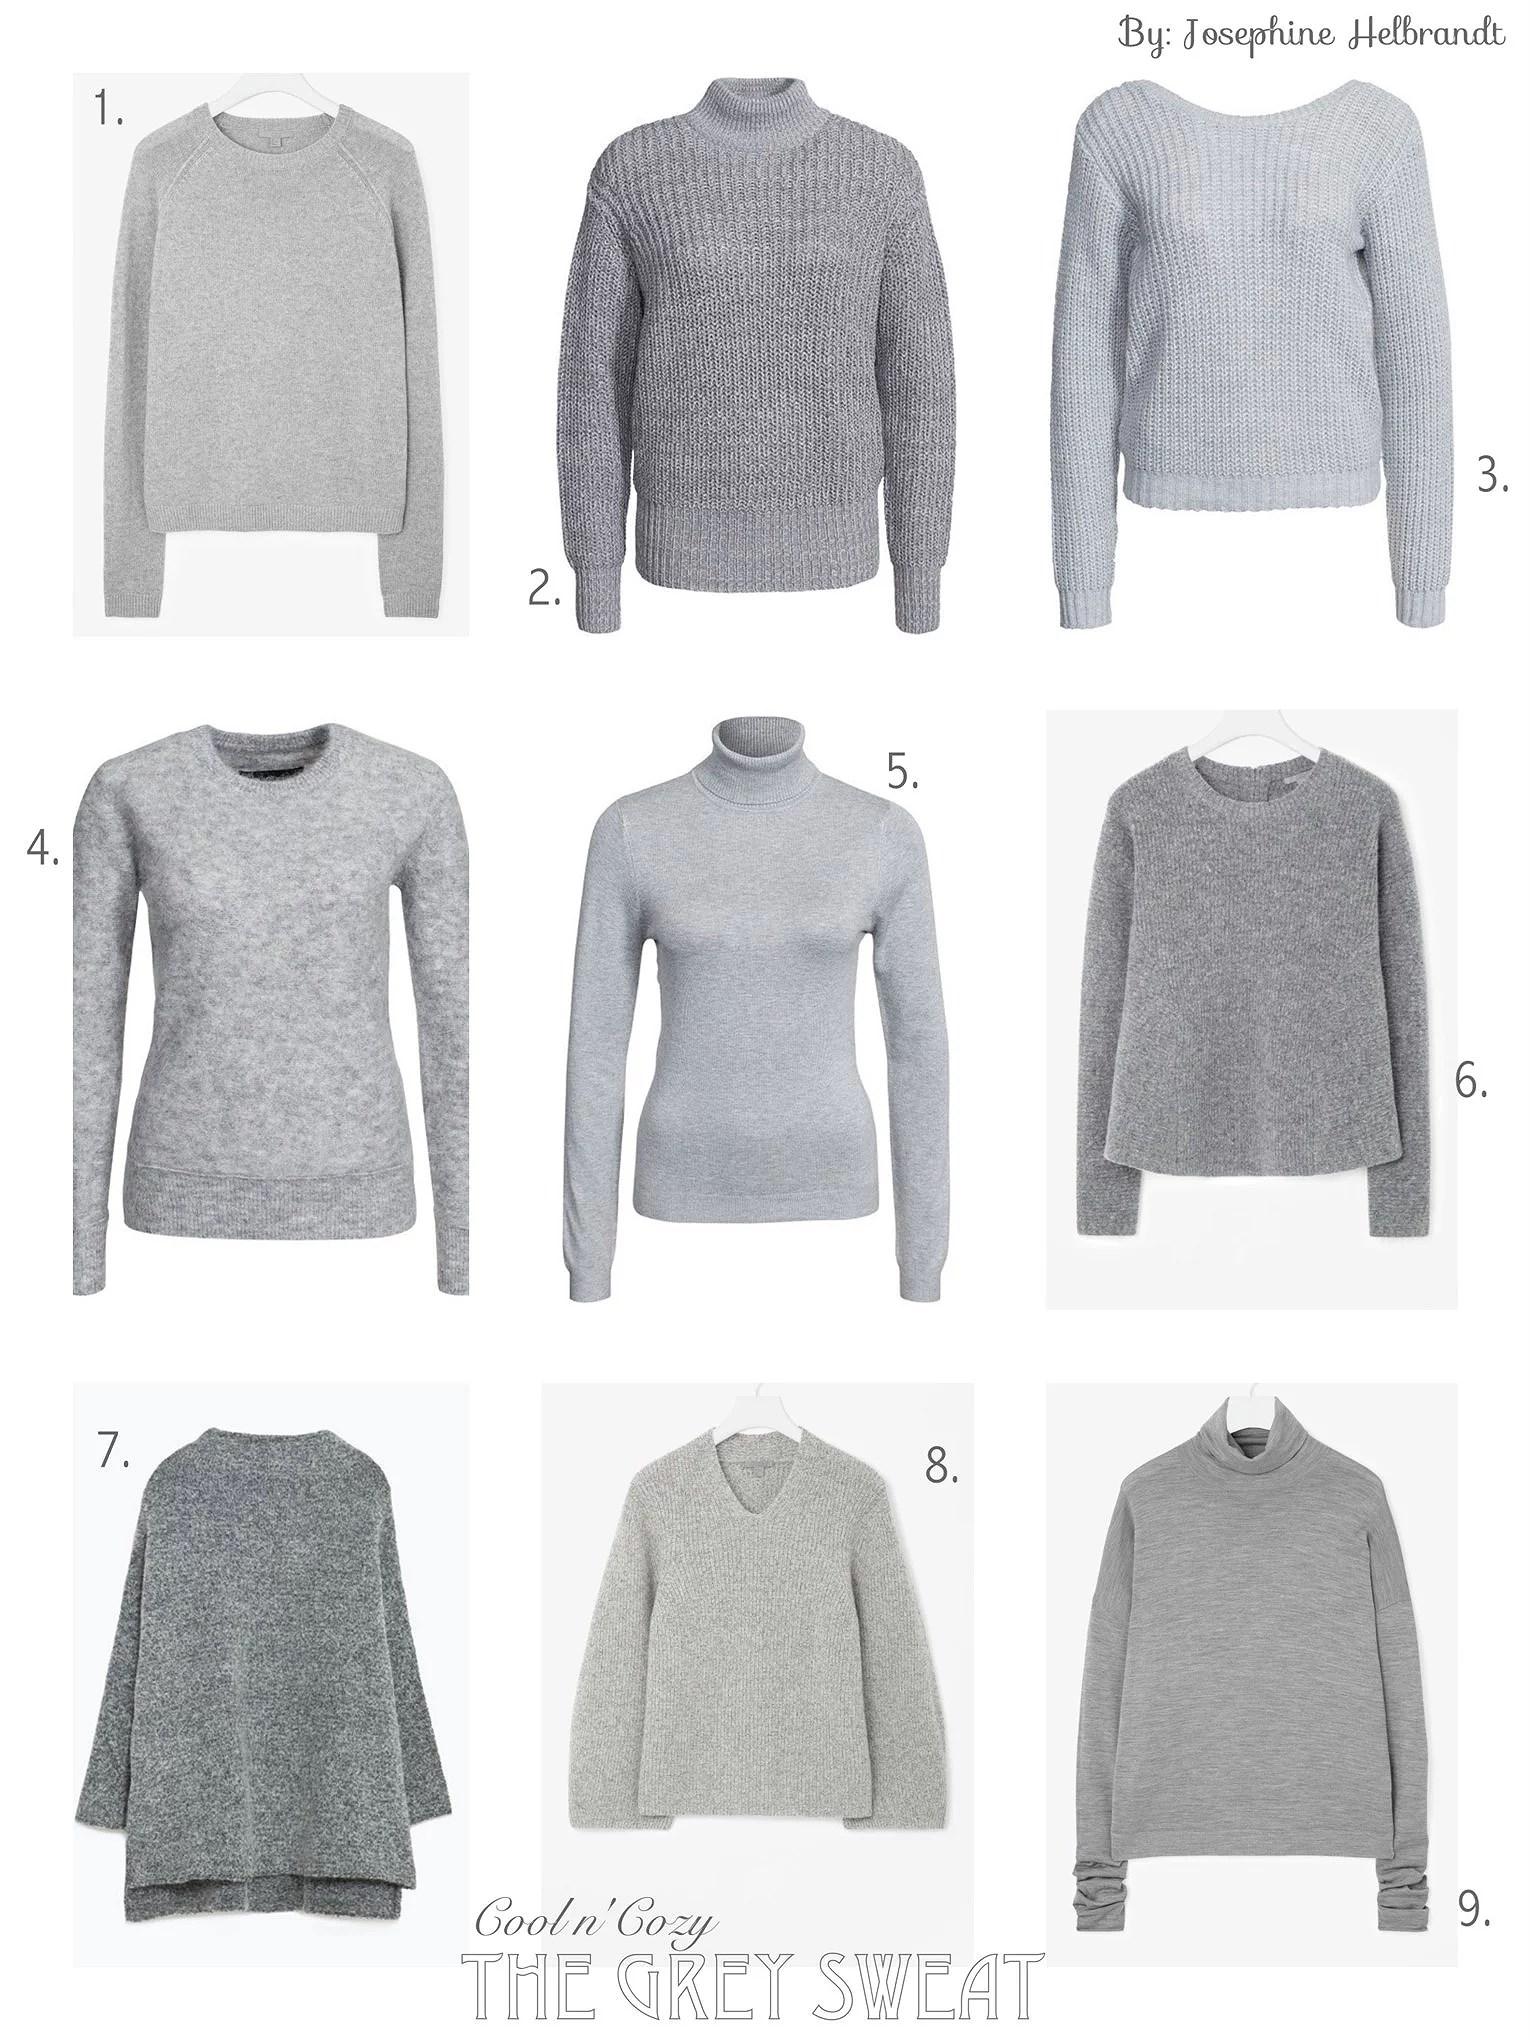 Fashion Inspiration // The Grey Sweat